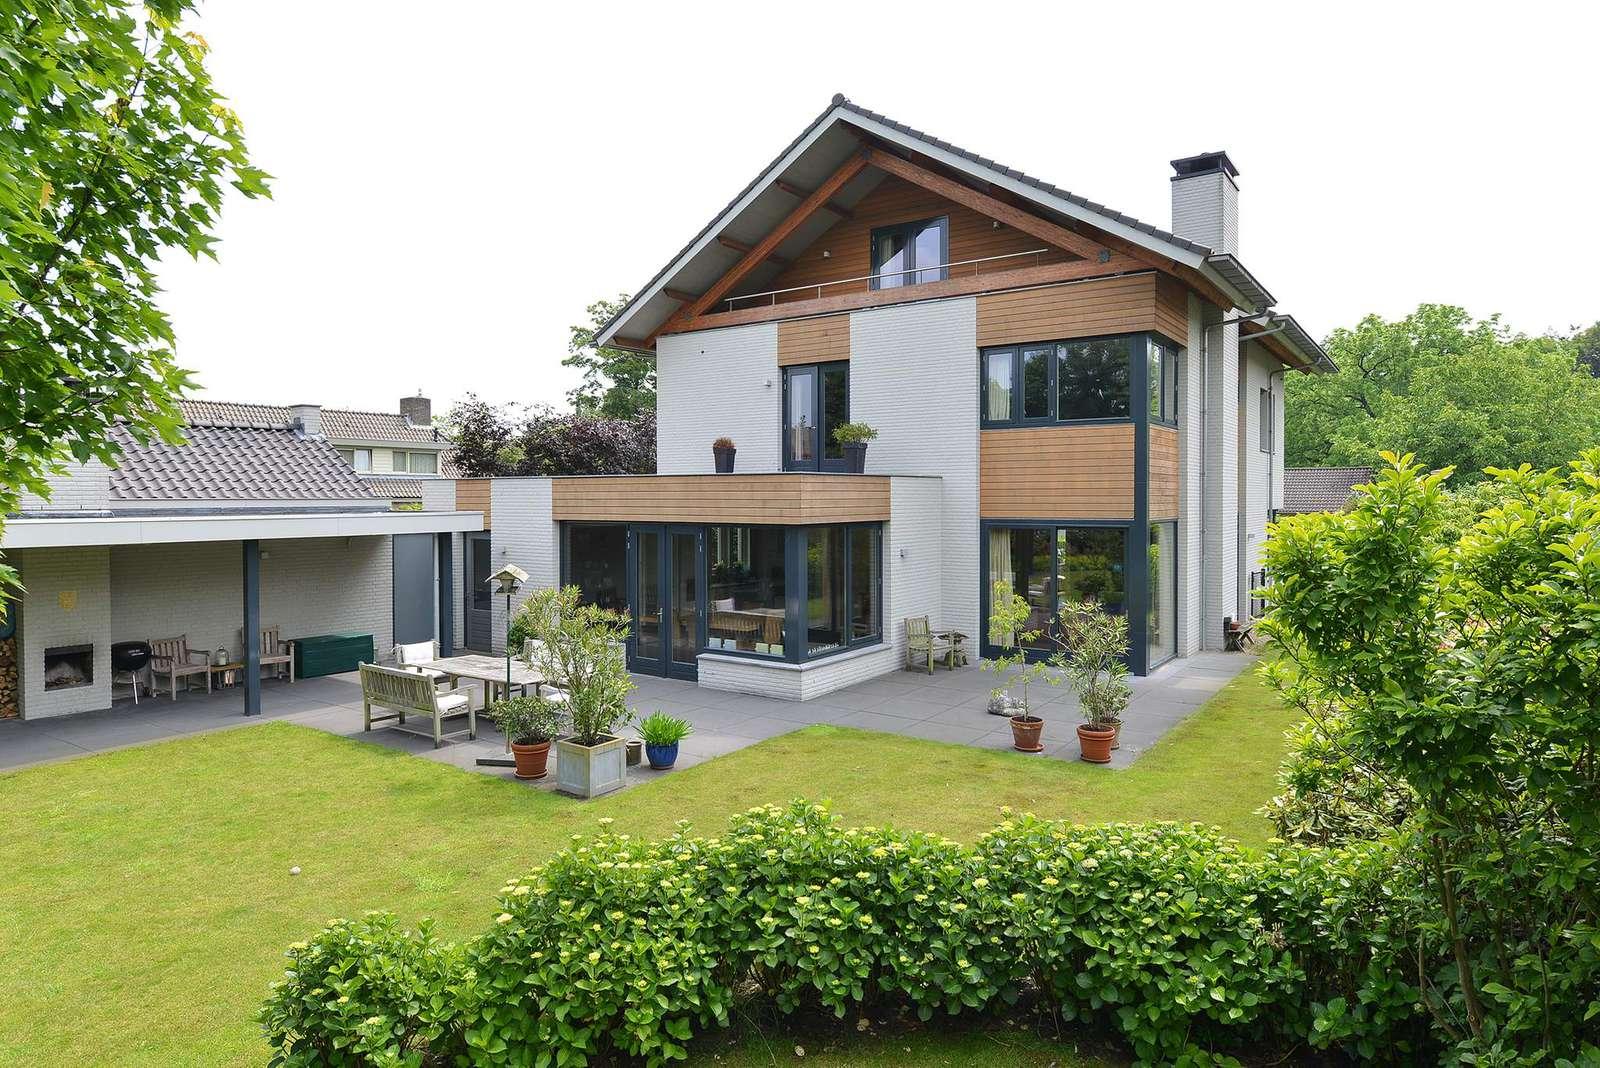 Constantijnlaan 2, villa Vught